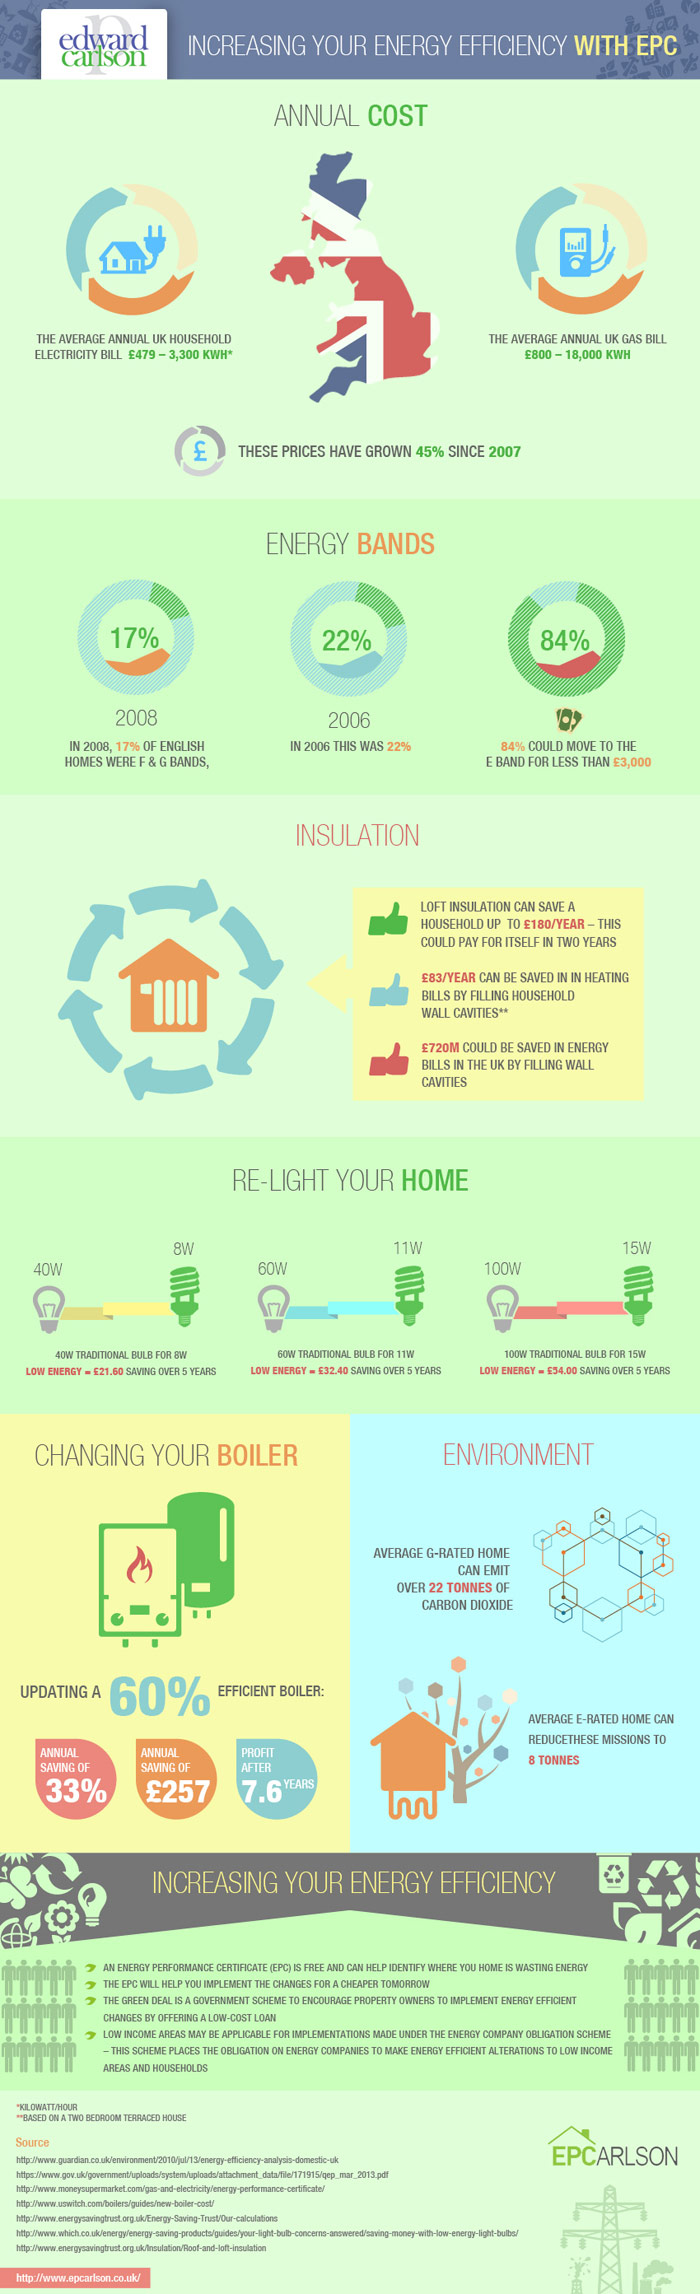 Increasing Energy Efficiency - Infographic